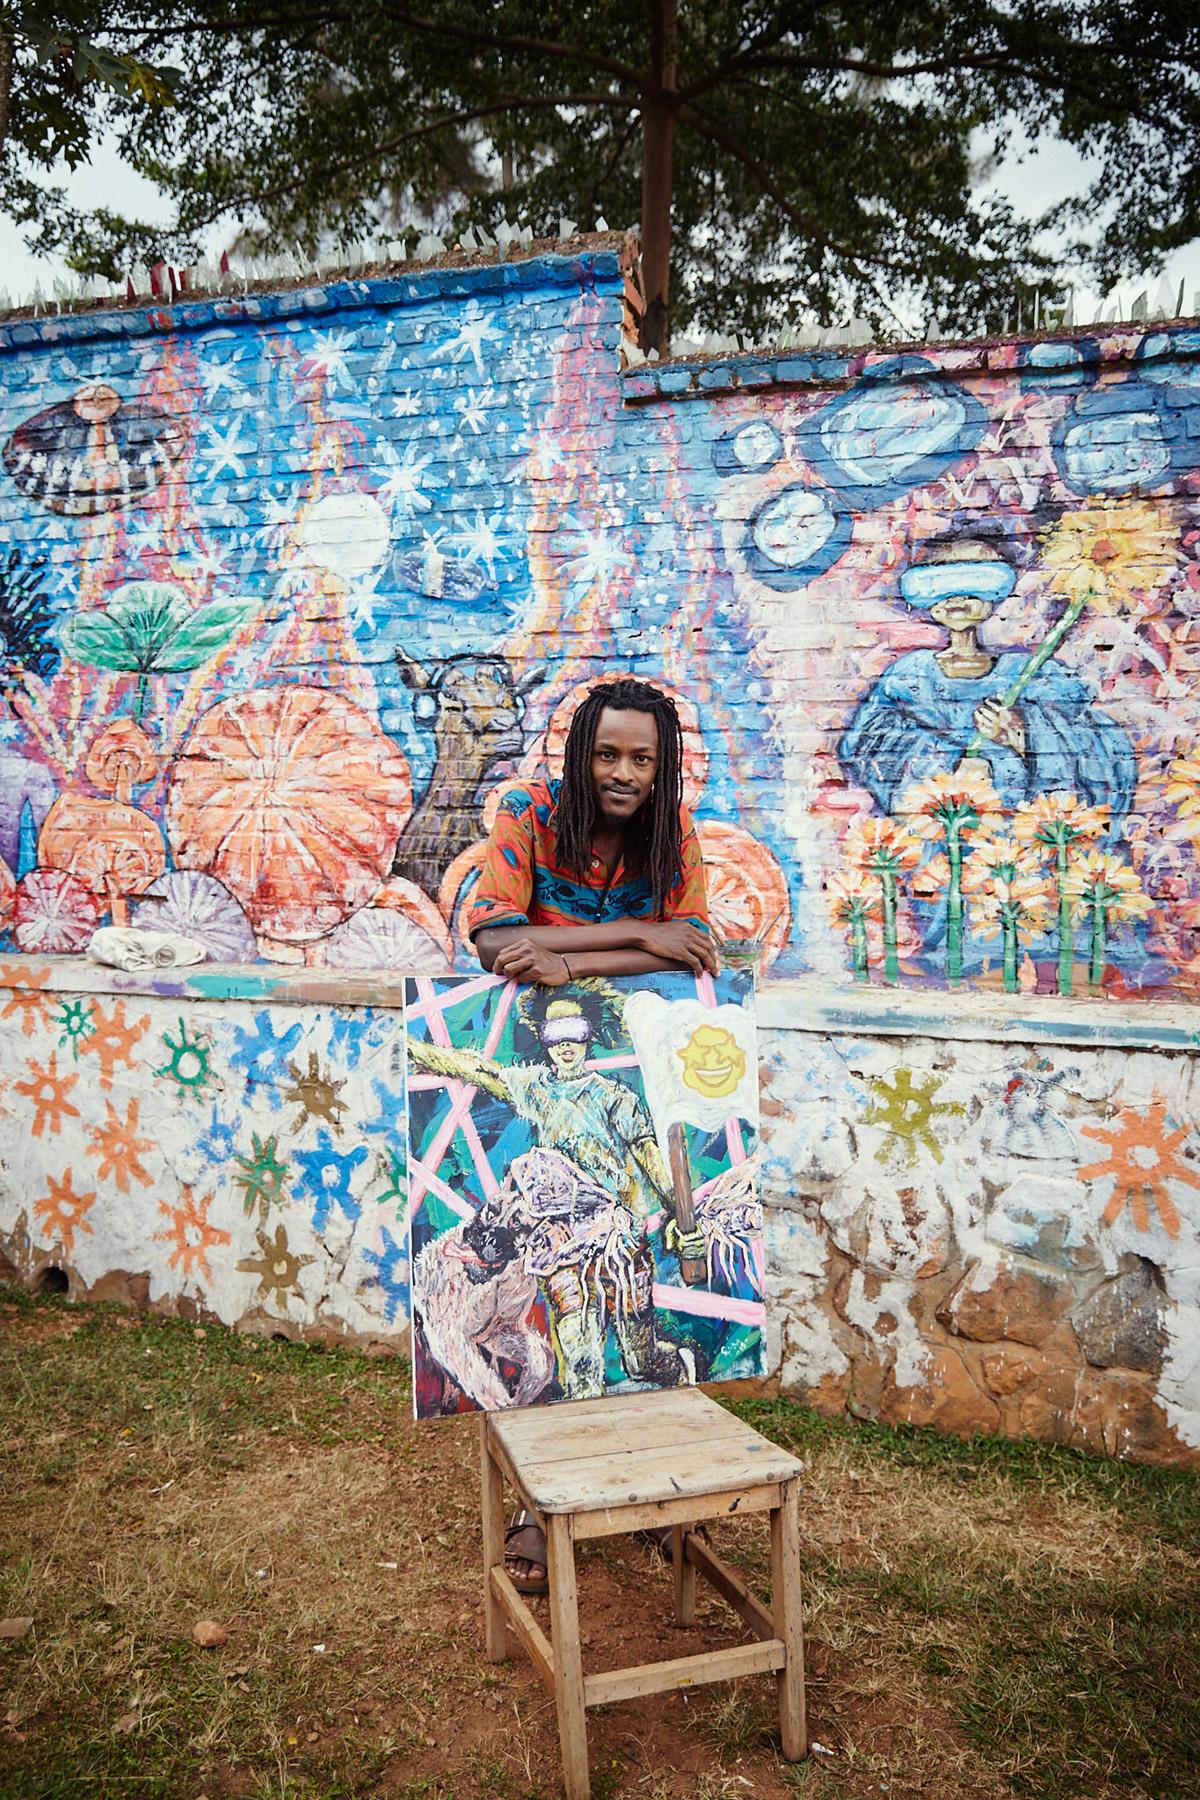 ds19_Slanted_Rwanda_KuuruArtSpace12884